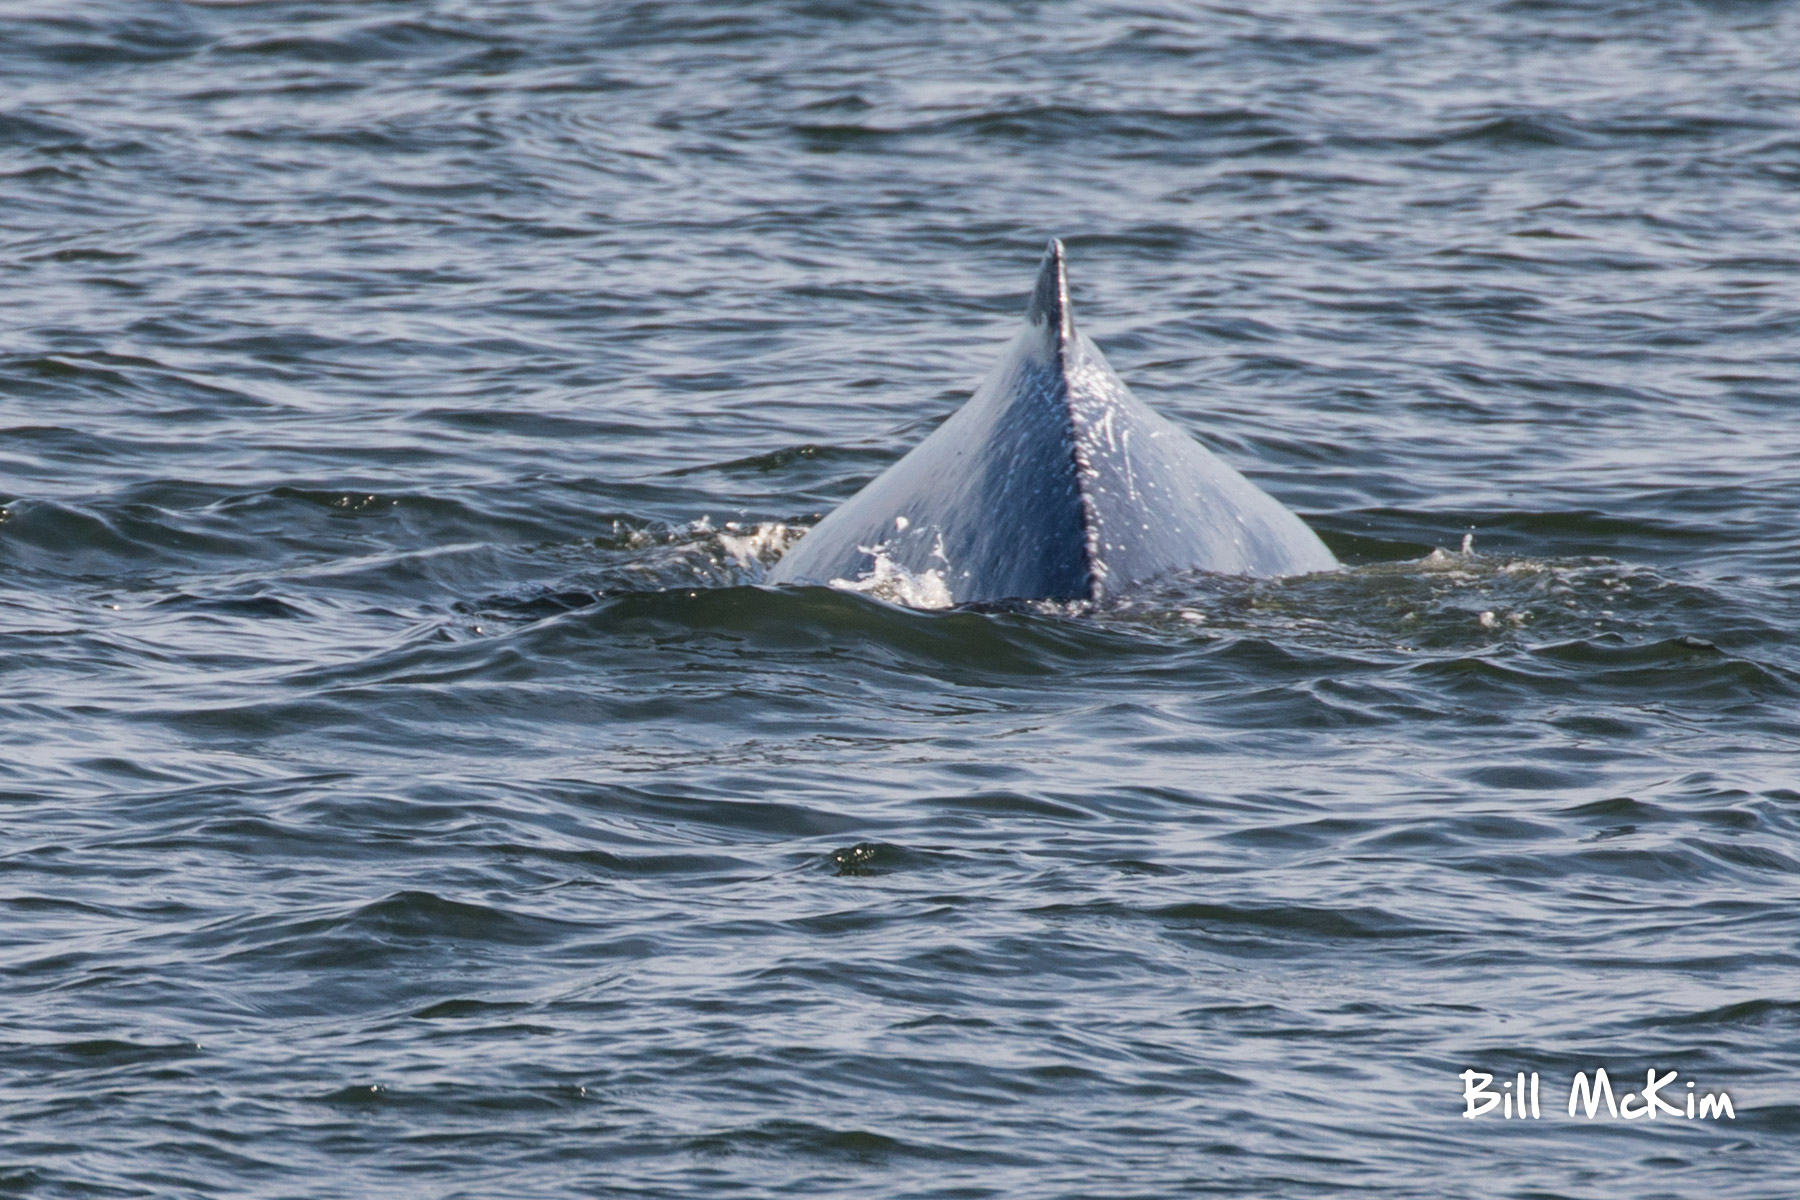 Jersey shore whale watching bill mckim june25th-4771